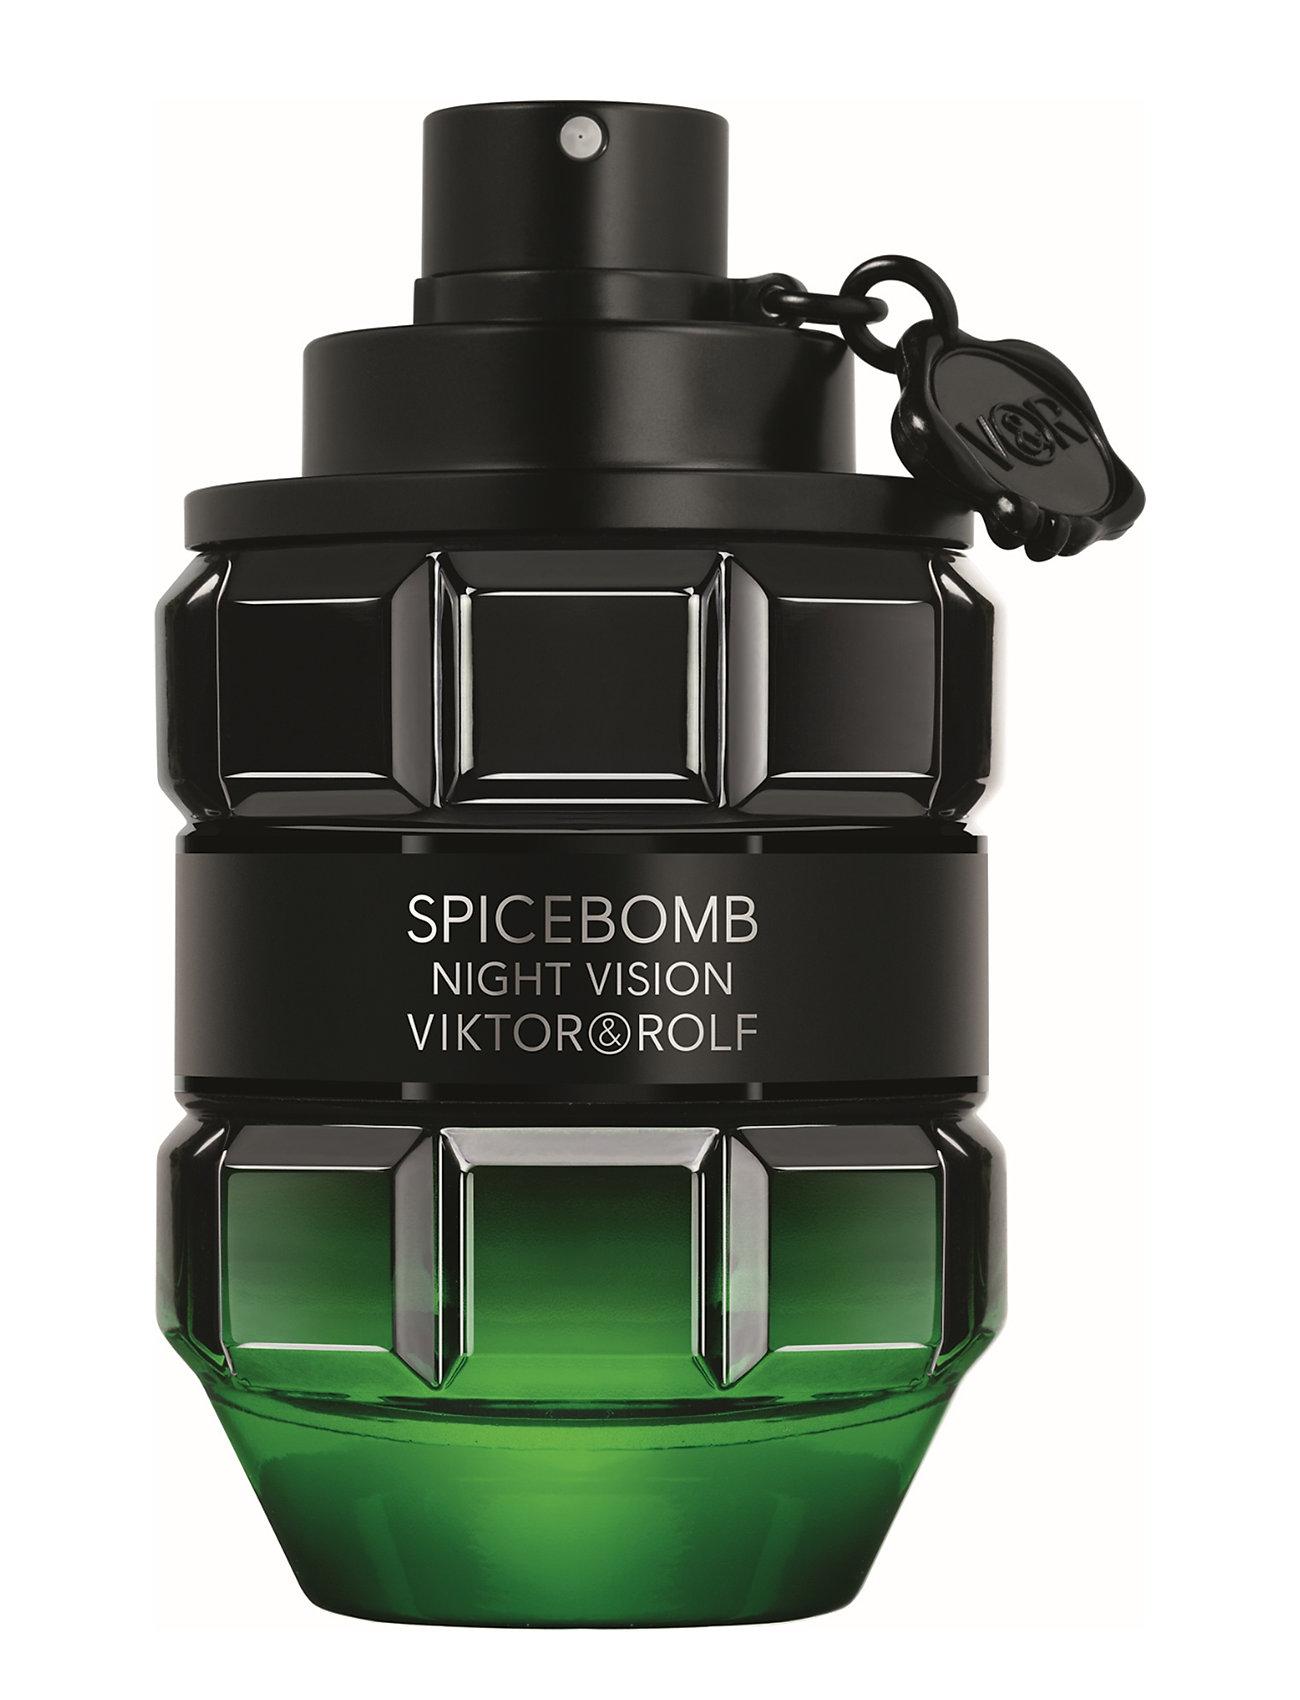 Viktor & Rolf Spicebomb Night Vision Edt 90 ml - CLEAR